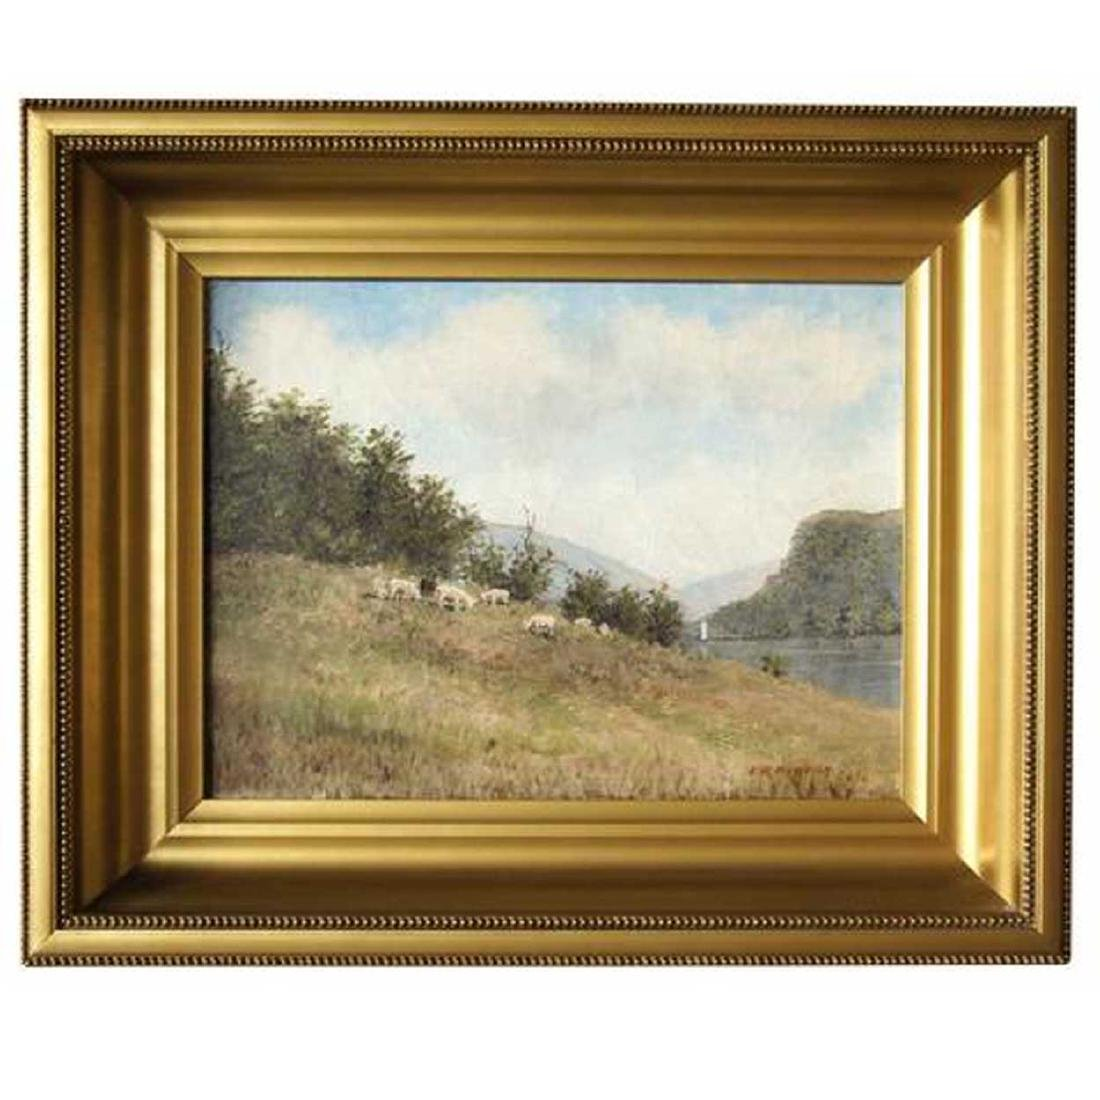 EDWARD ROMAINE BOWDISH Oil on Canvas Painting